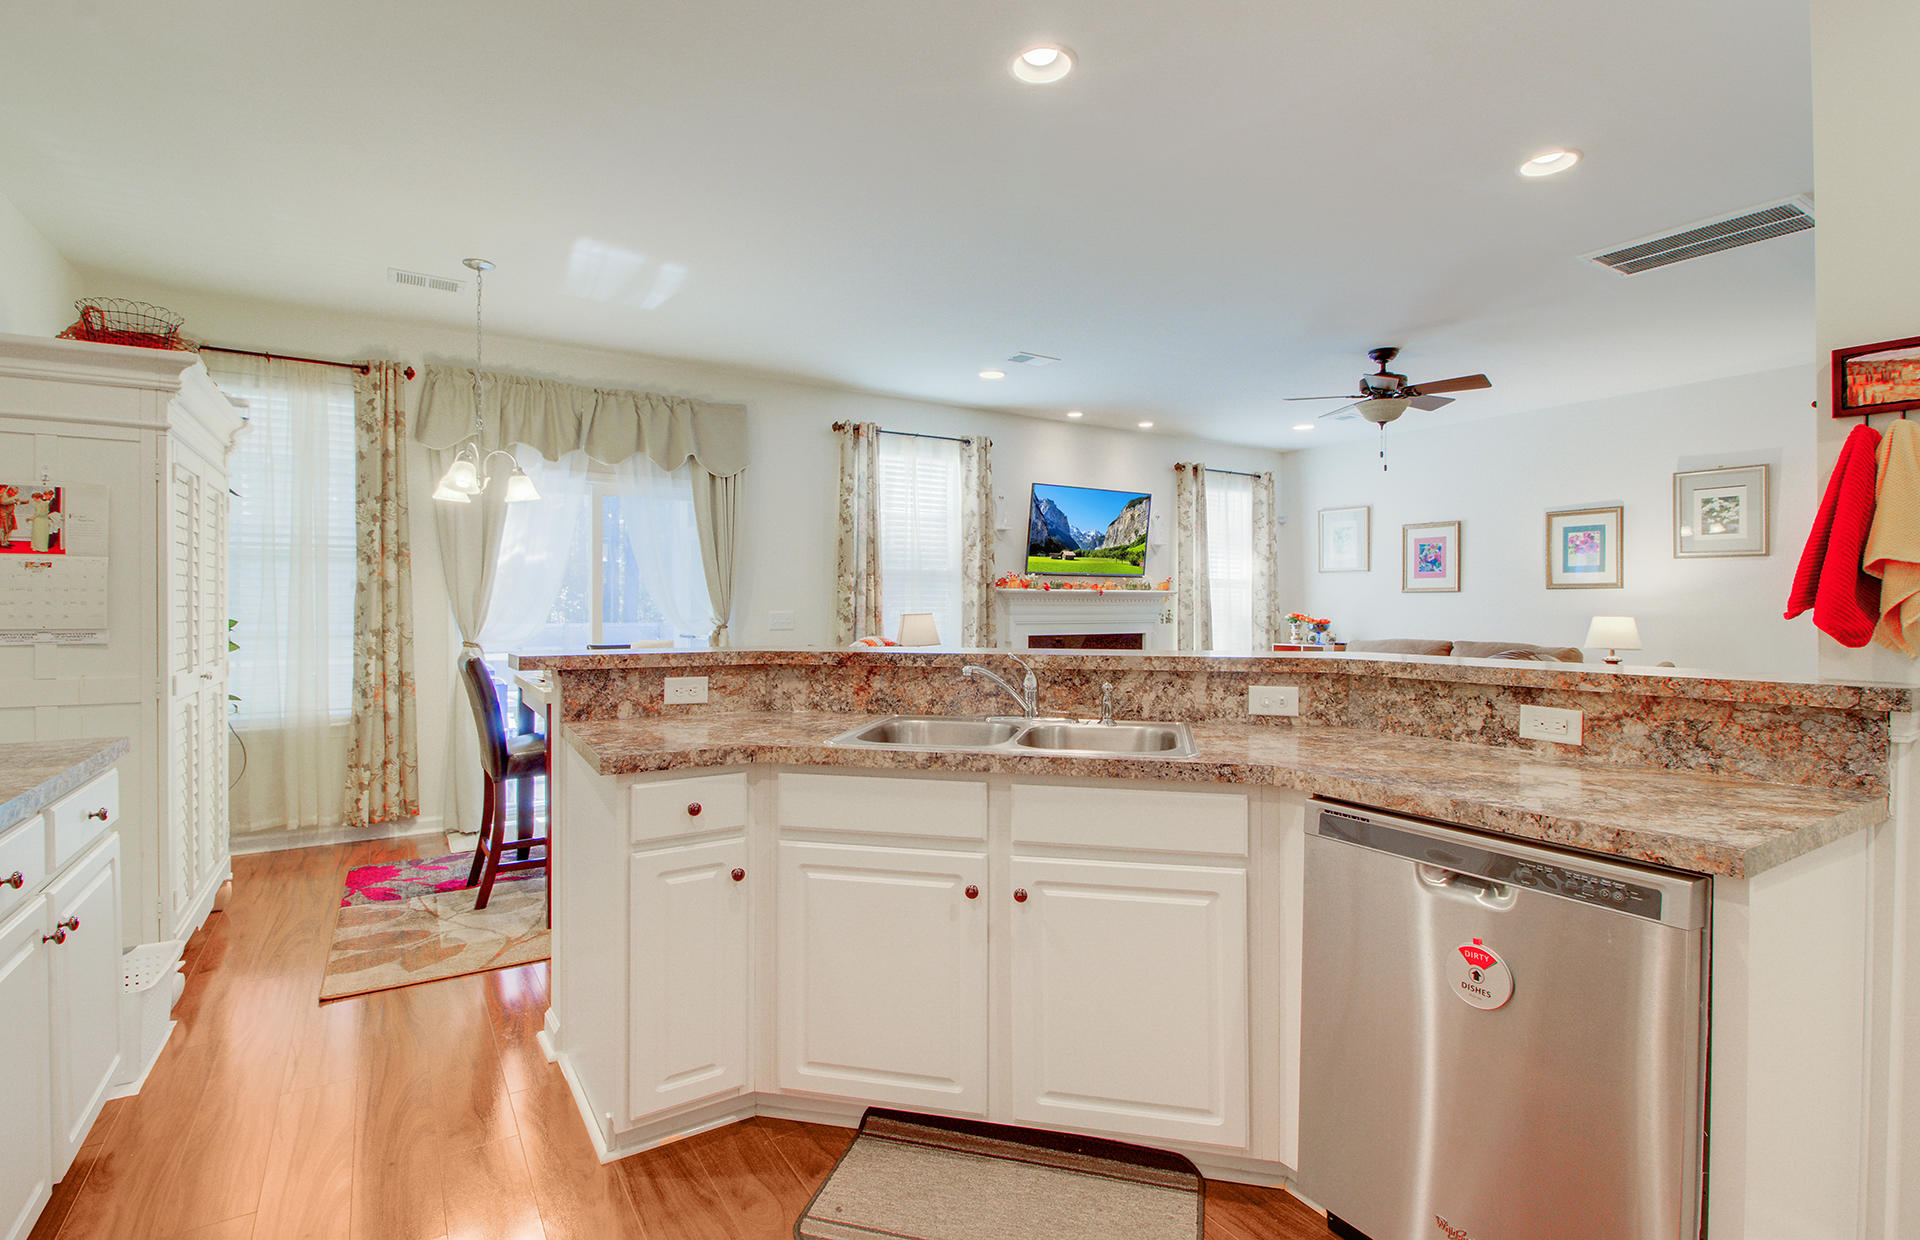 Cane Bay Plantation Homes For Sale - 255 Spectrum, Summerville, SC - 11